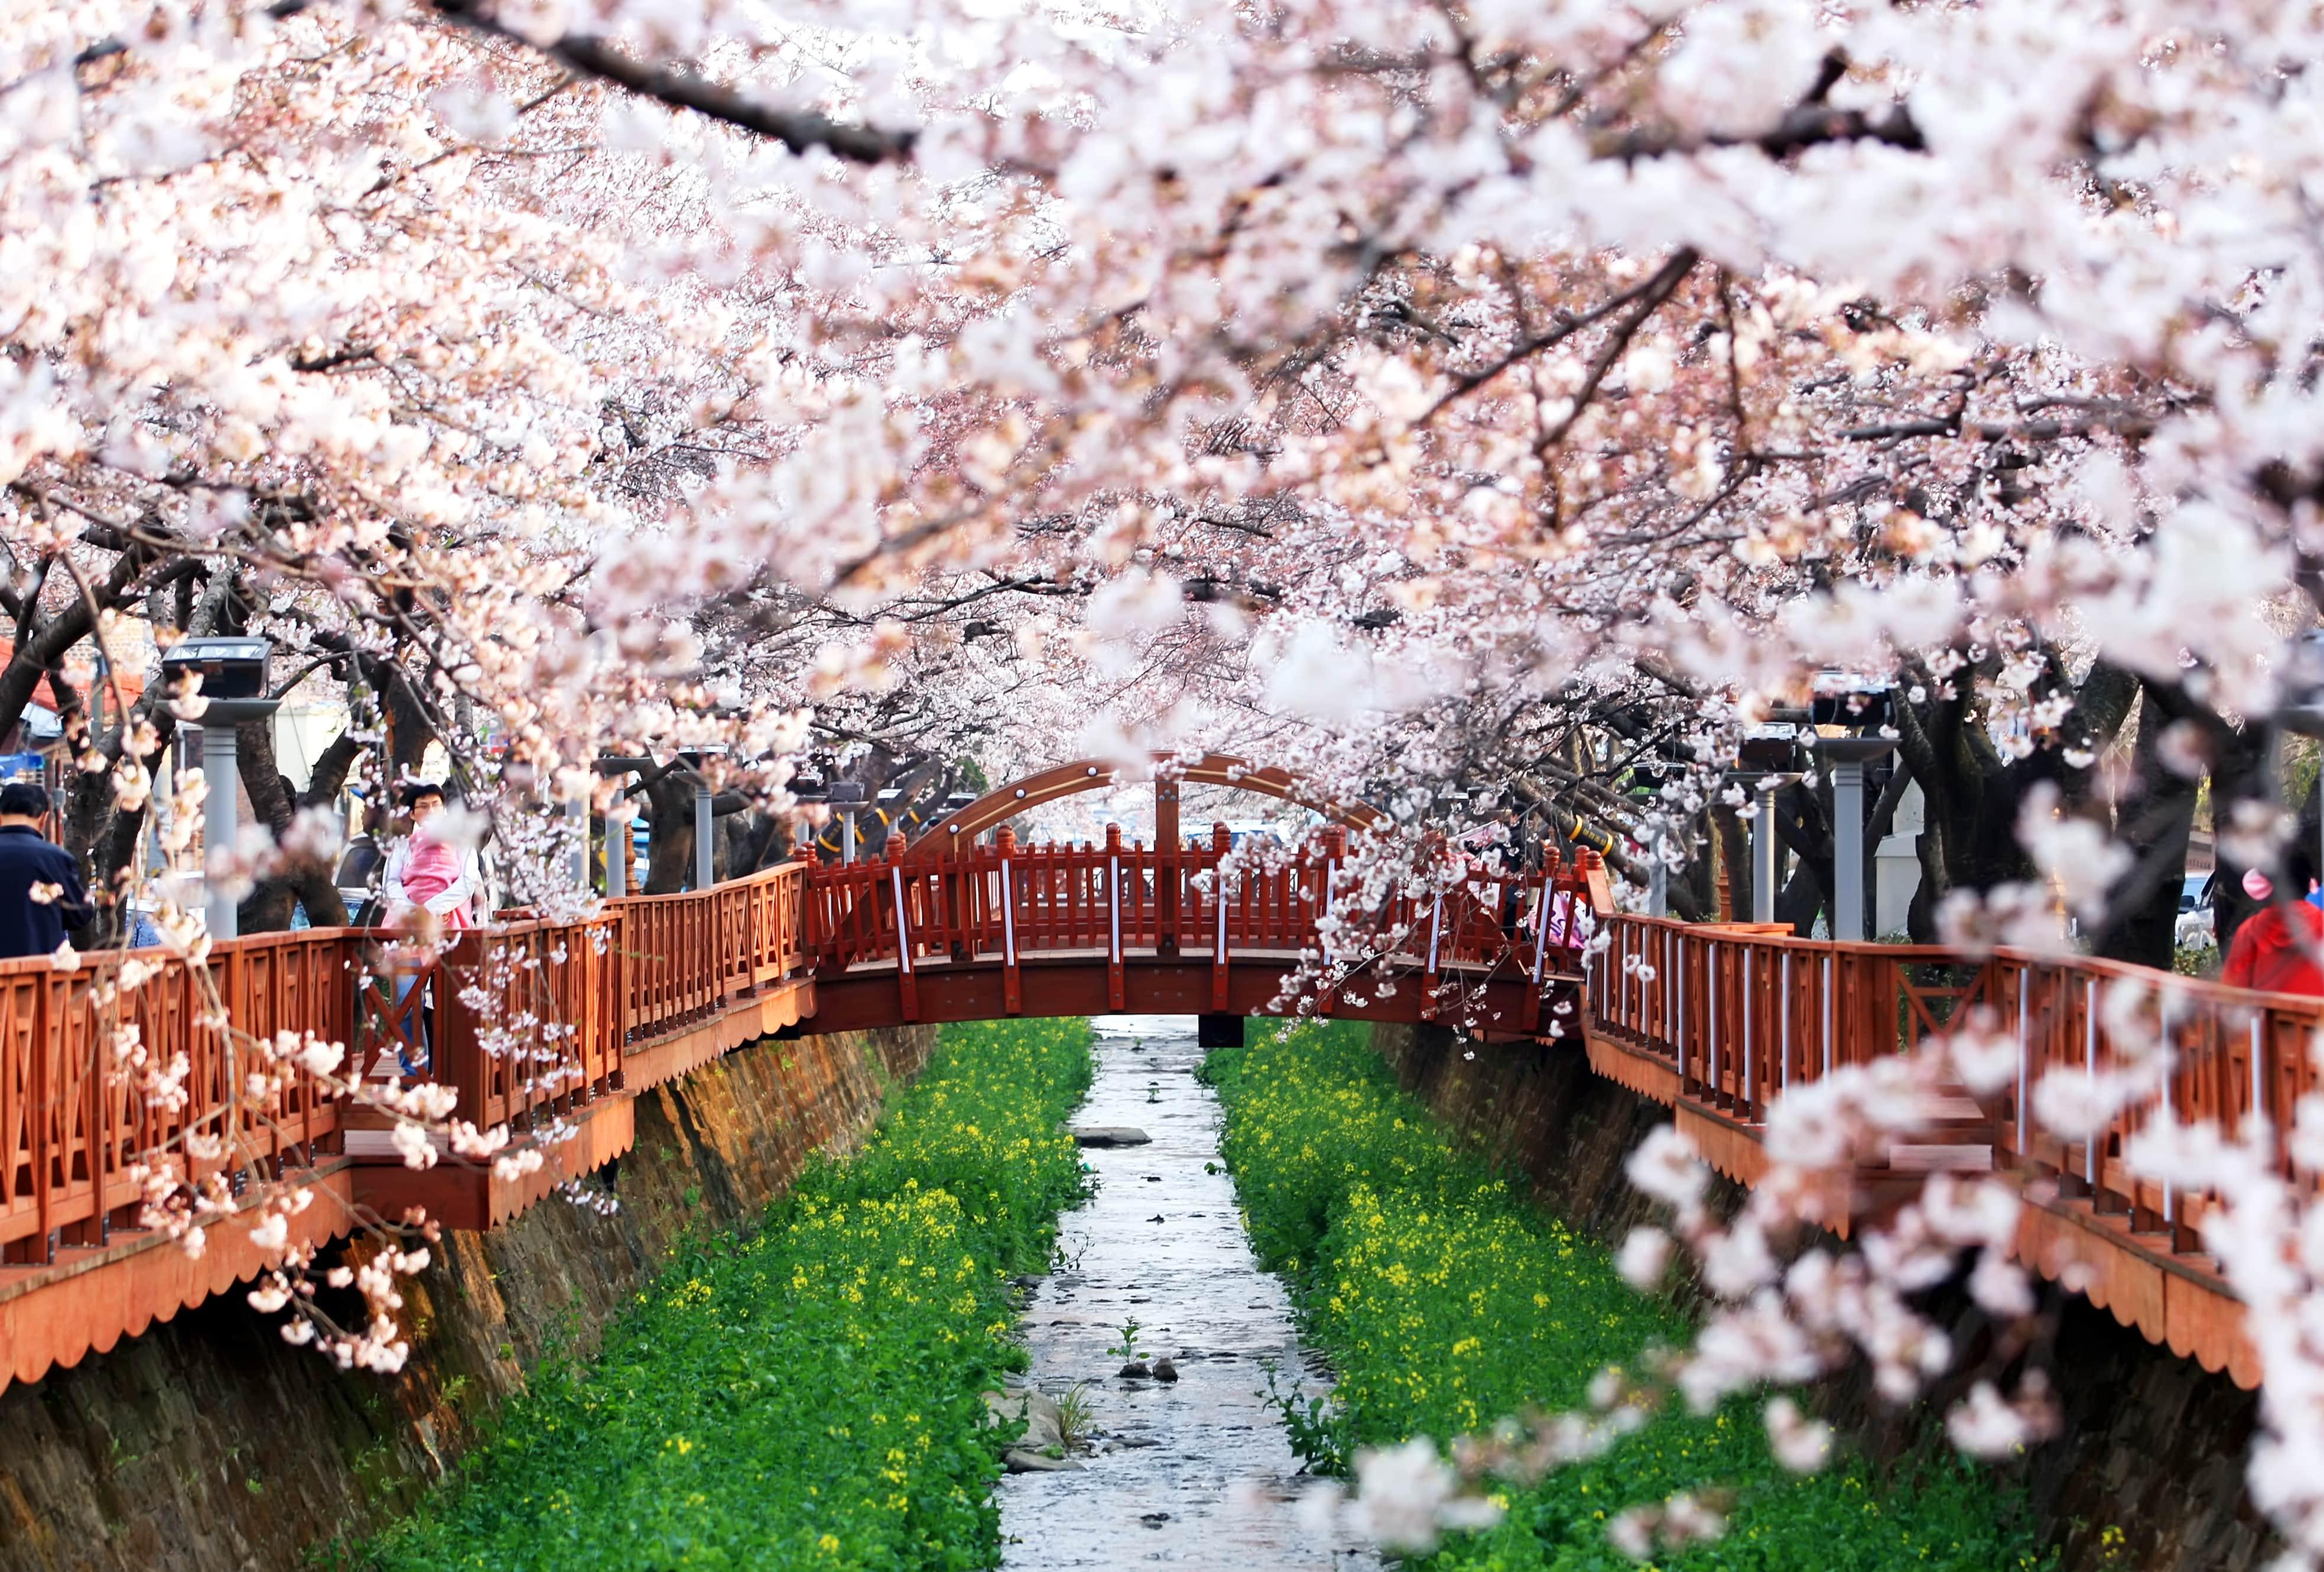 kota-changwon-dan-festival-bunga-sakura-secret-world